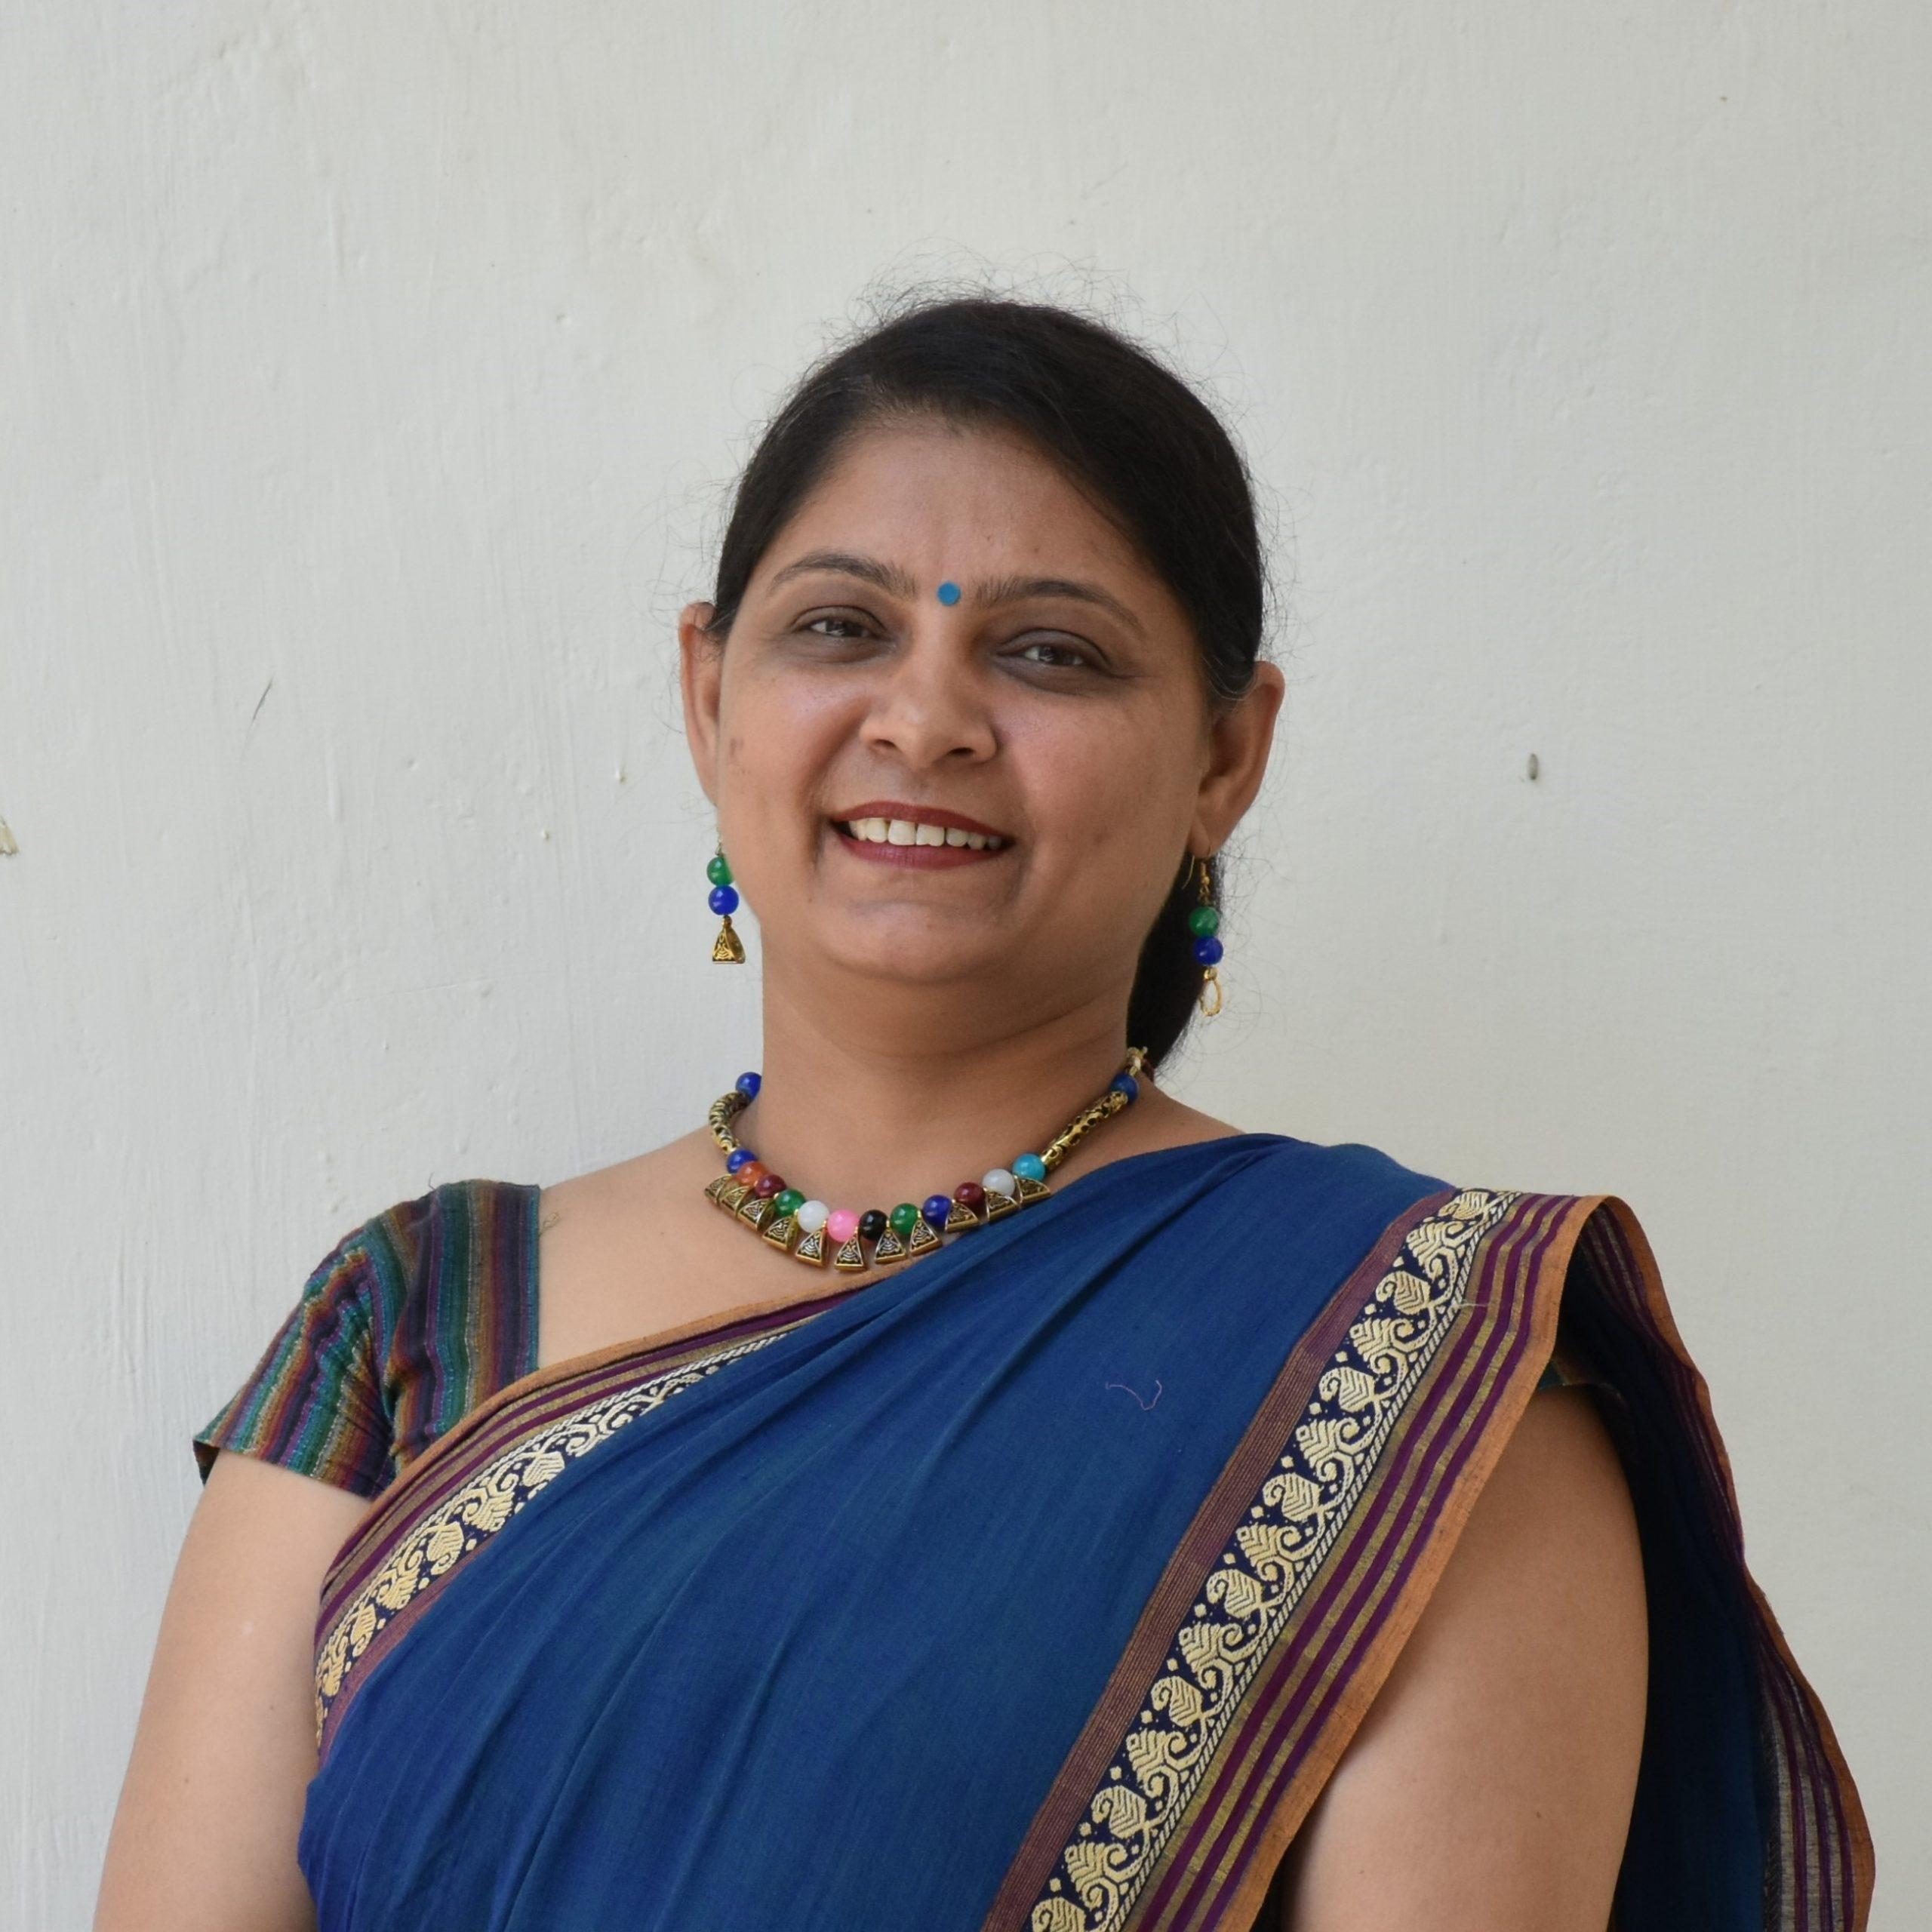 Ms. Mital J. Patel